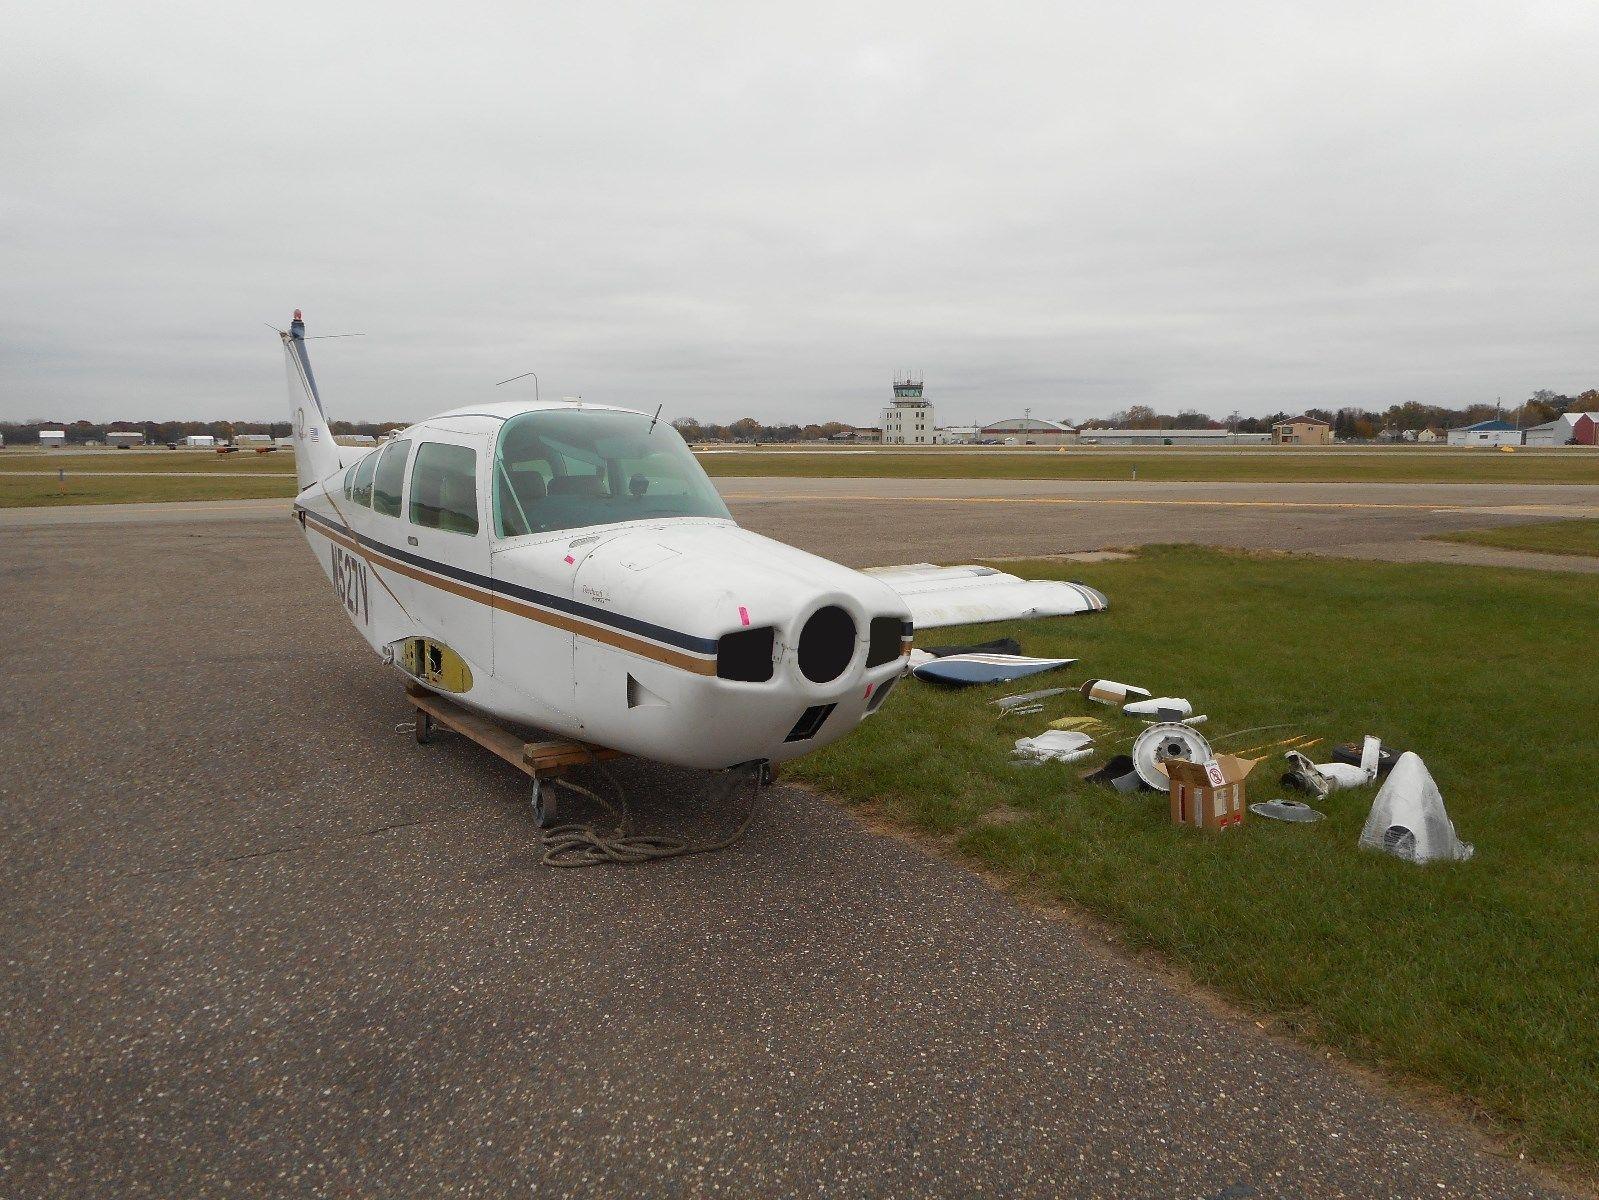 minor damage 1974 Beech B 24R Sierra aircraft for sale